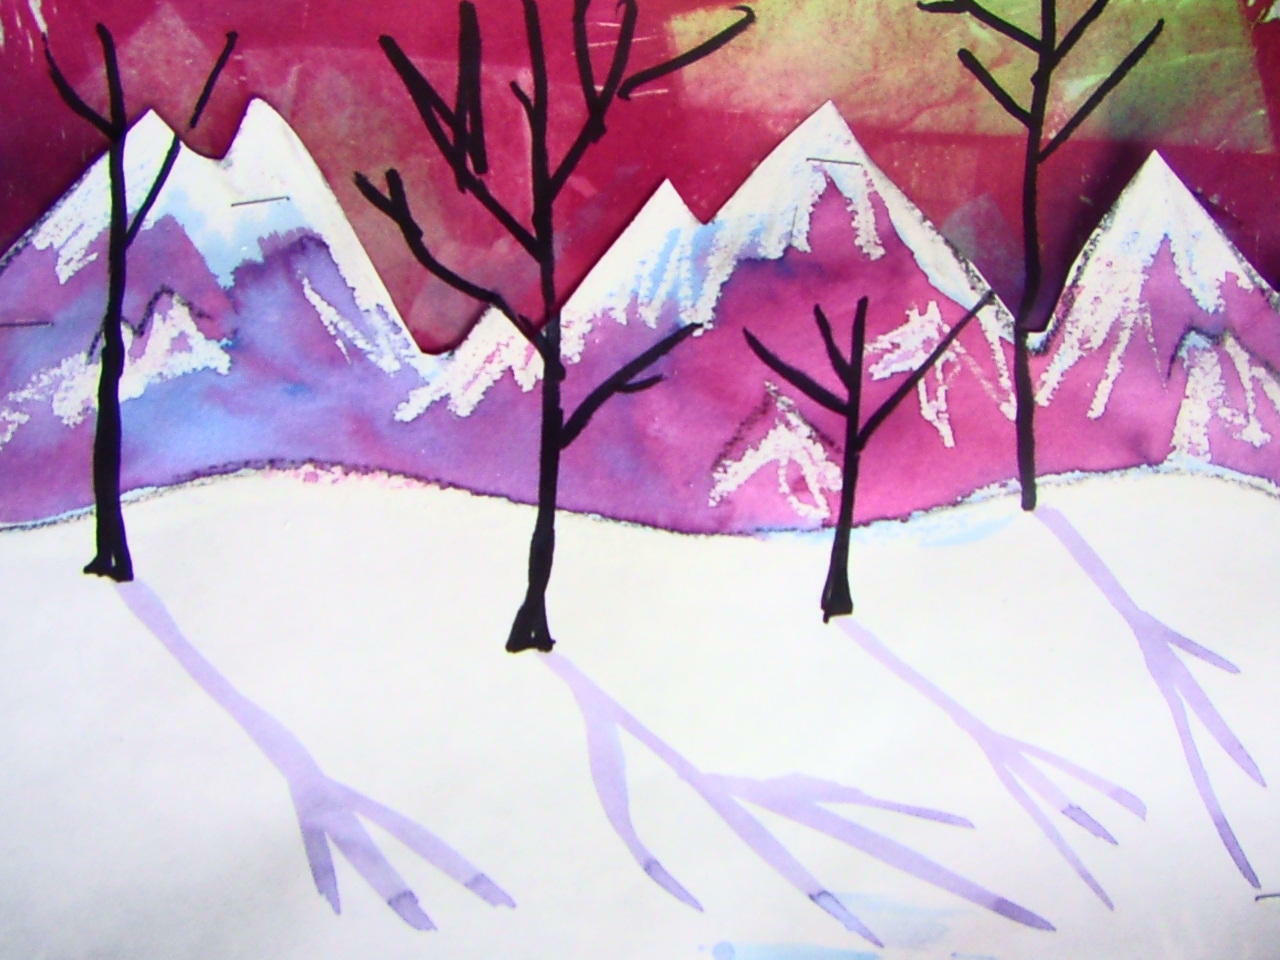 Line Drawing Ks2 : Ks art ideas and resources artists artwork